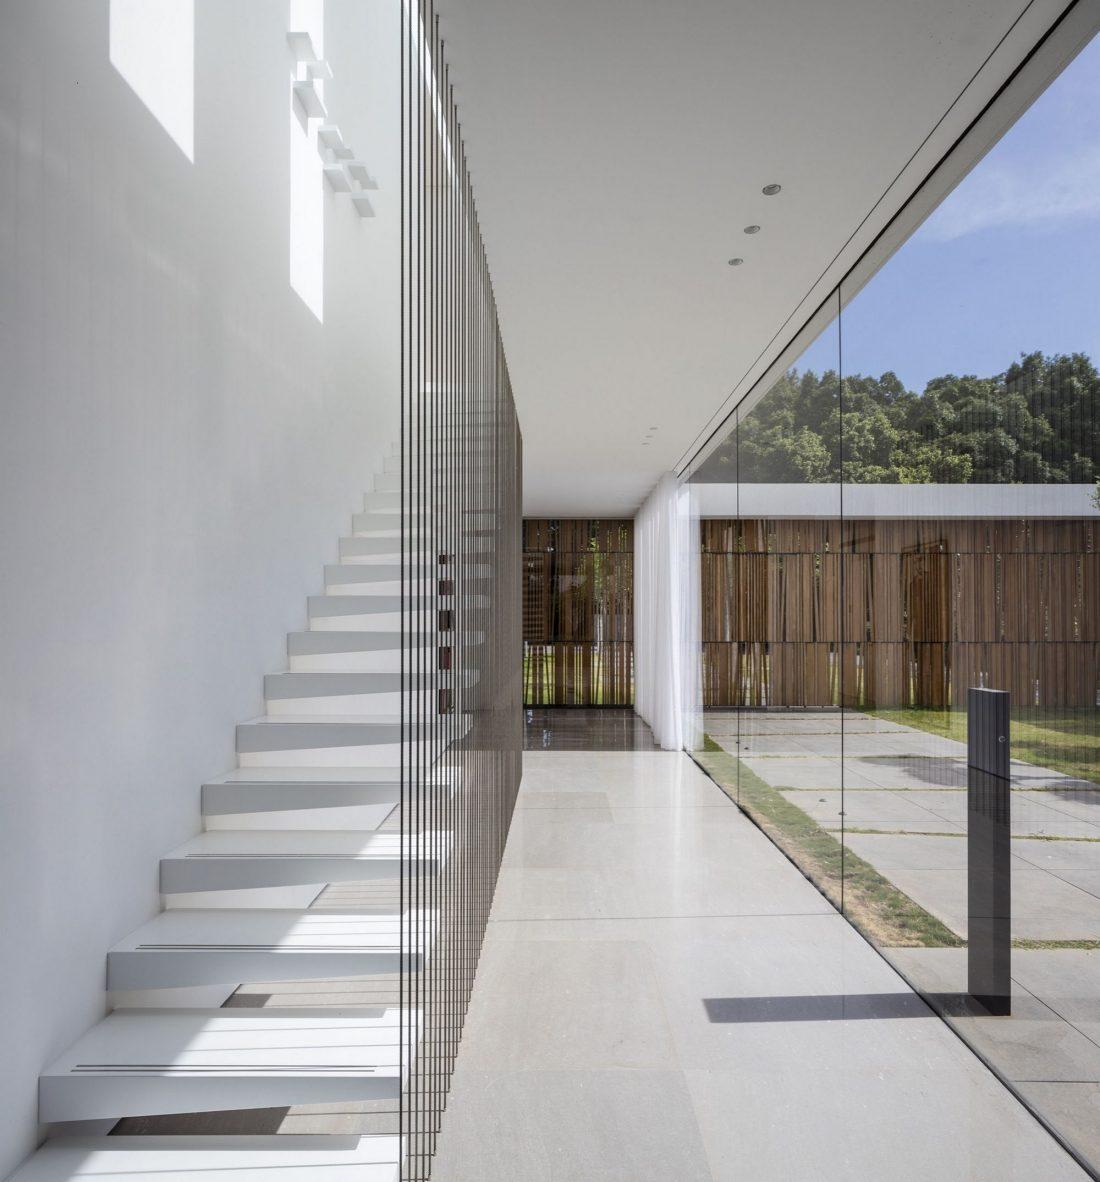 700-kvadratnyh-metrov-sveta-f-house-po-proektu-studii-pitsou-kedem-45